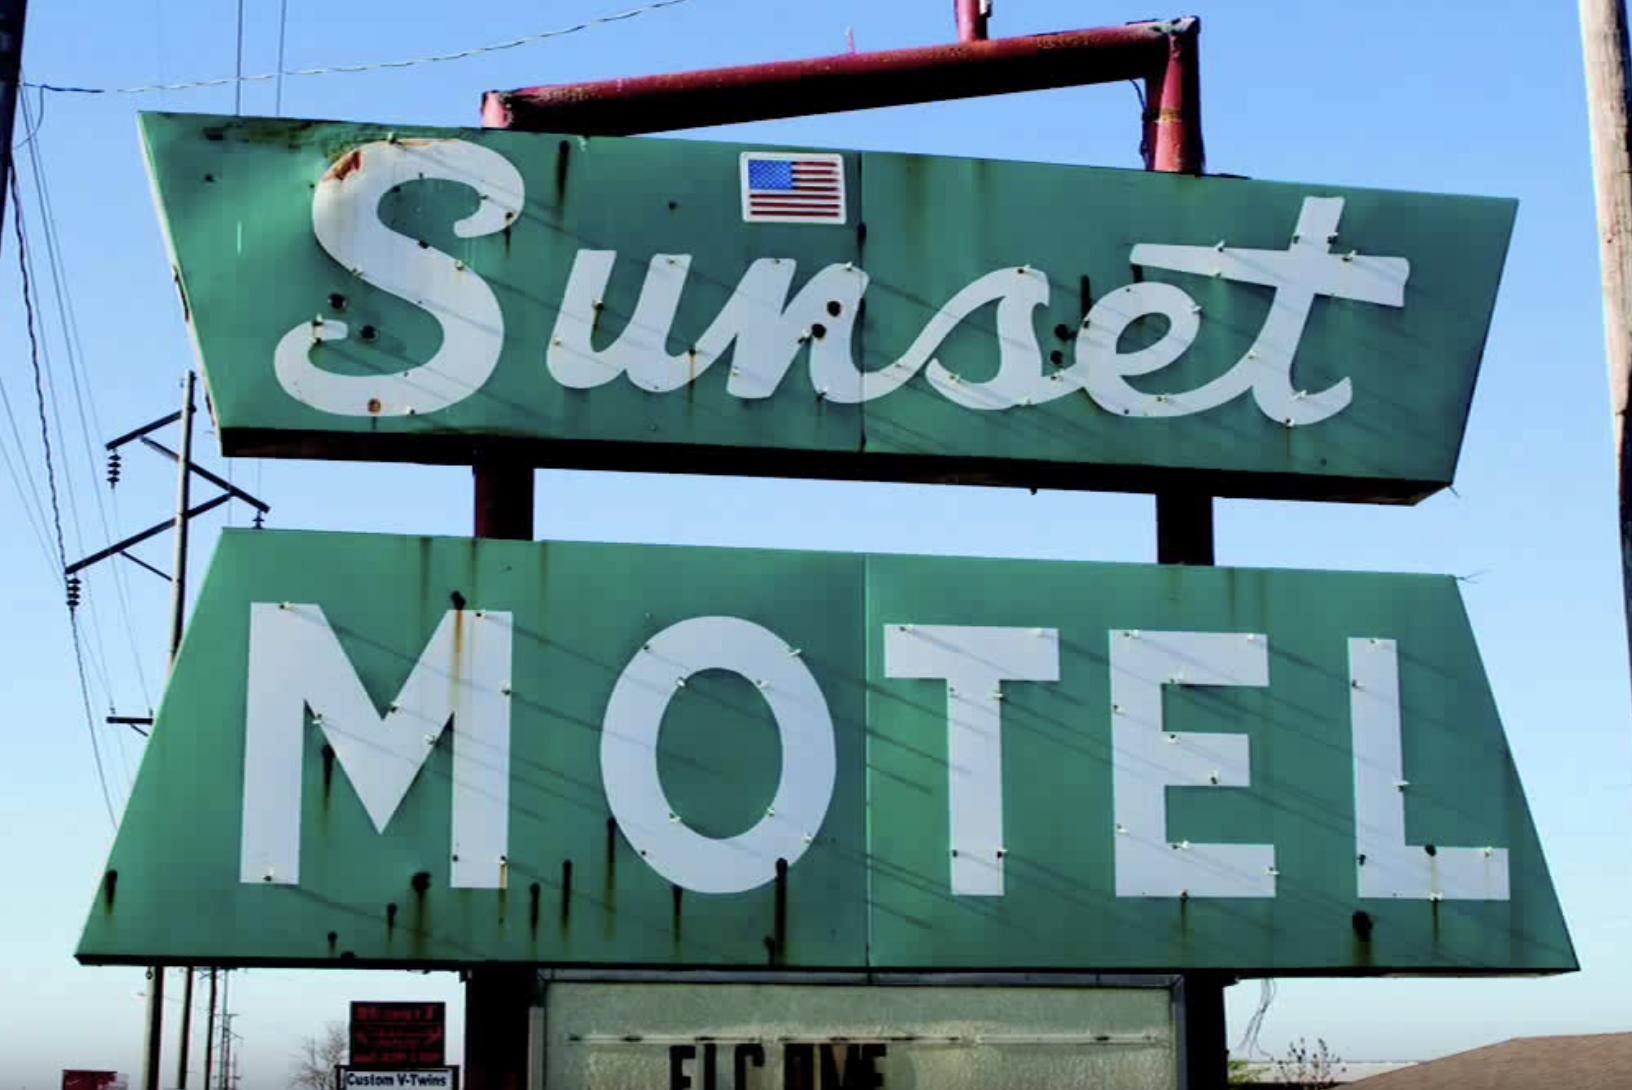 Sunset Motel sign